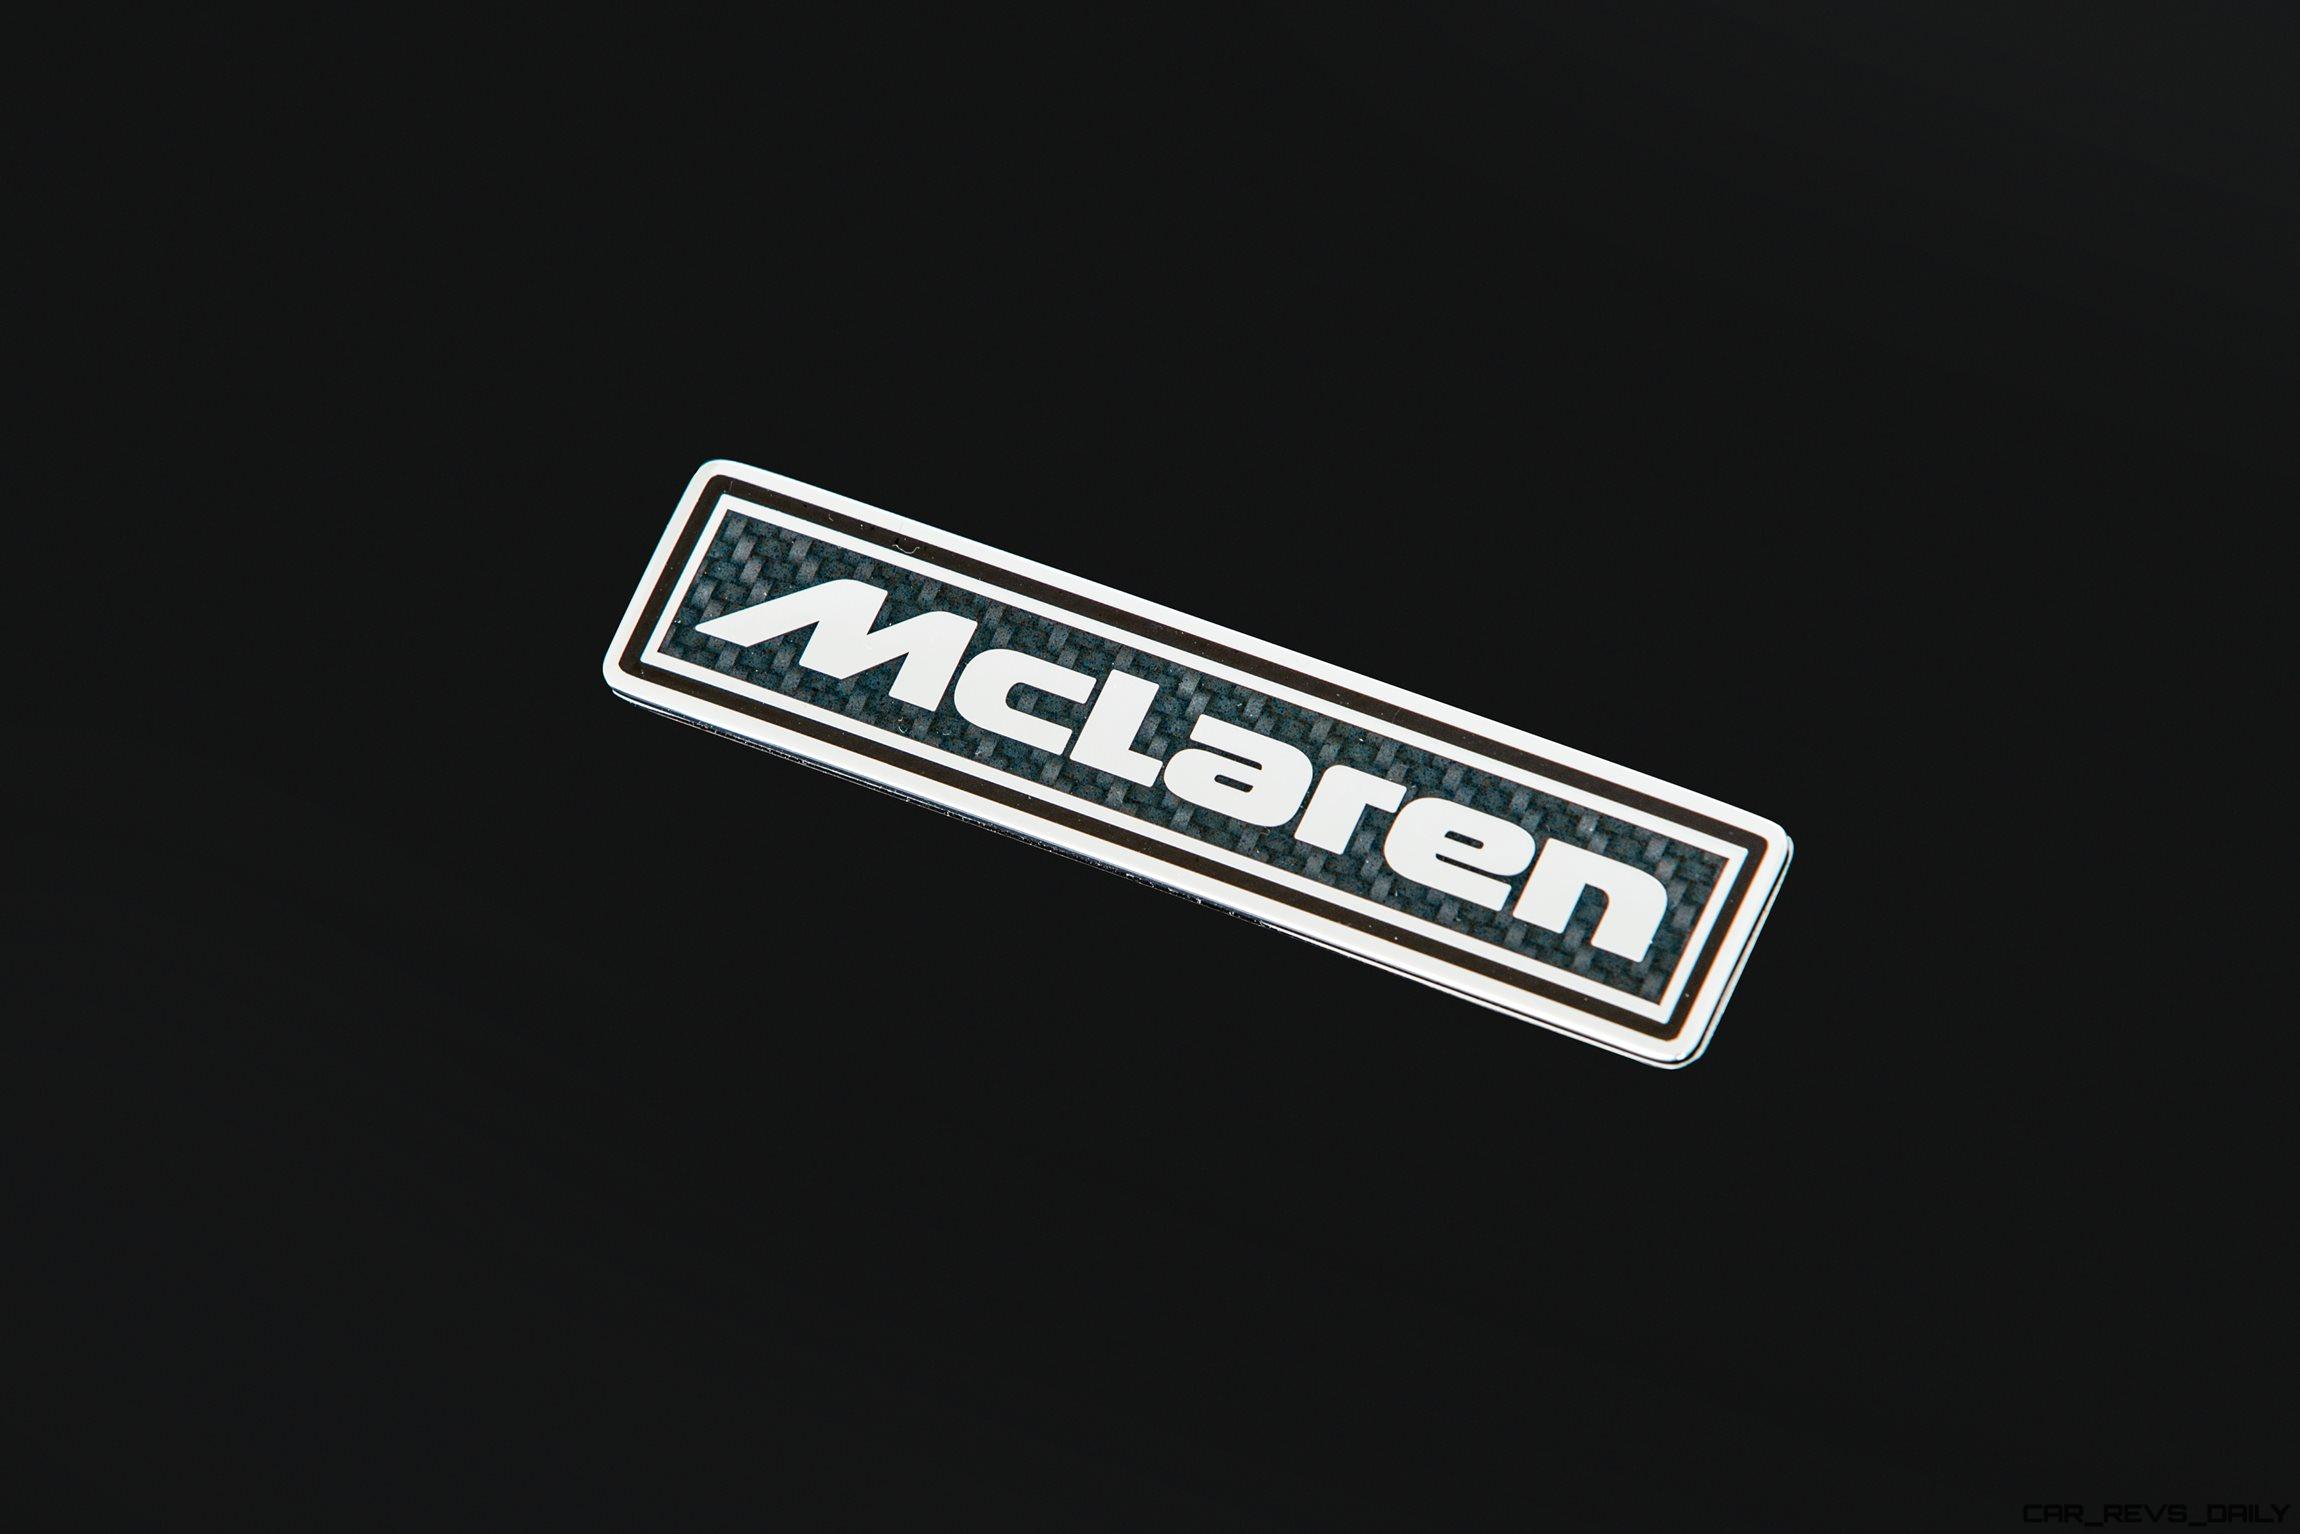 Mclaren P1 Gtr Logo >> 2016 Mclaren P1 Gtr 8